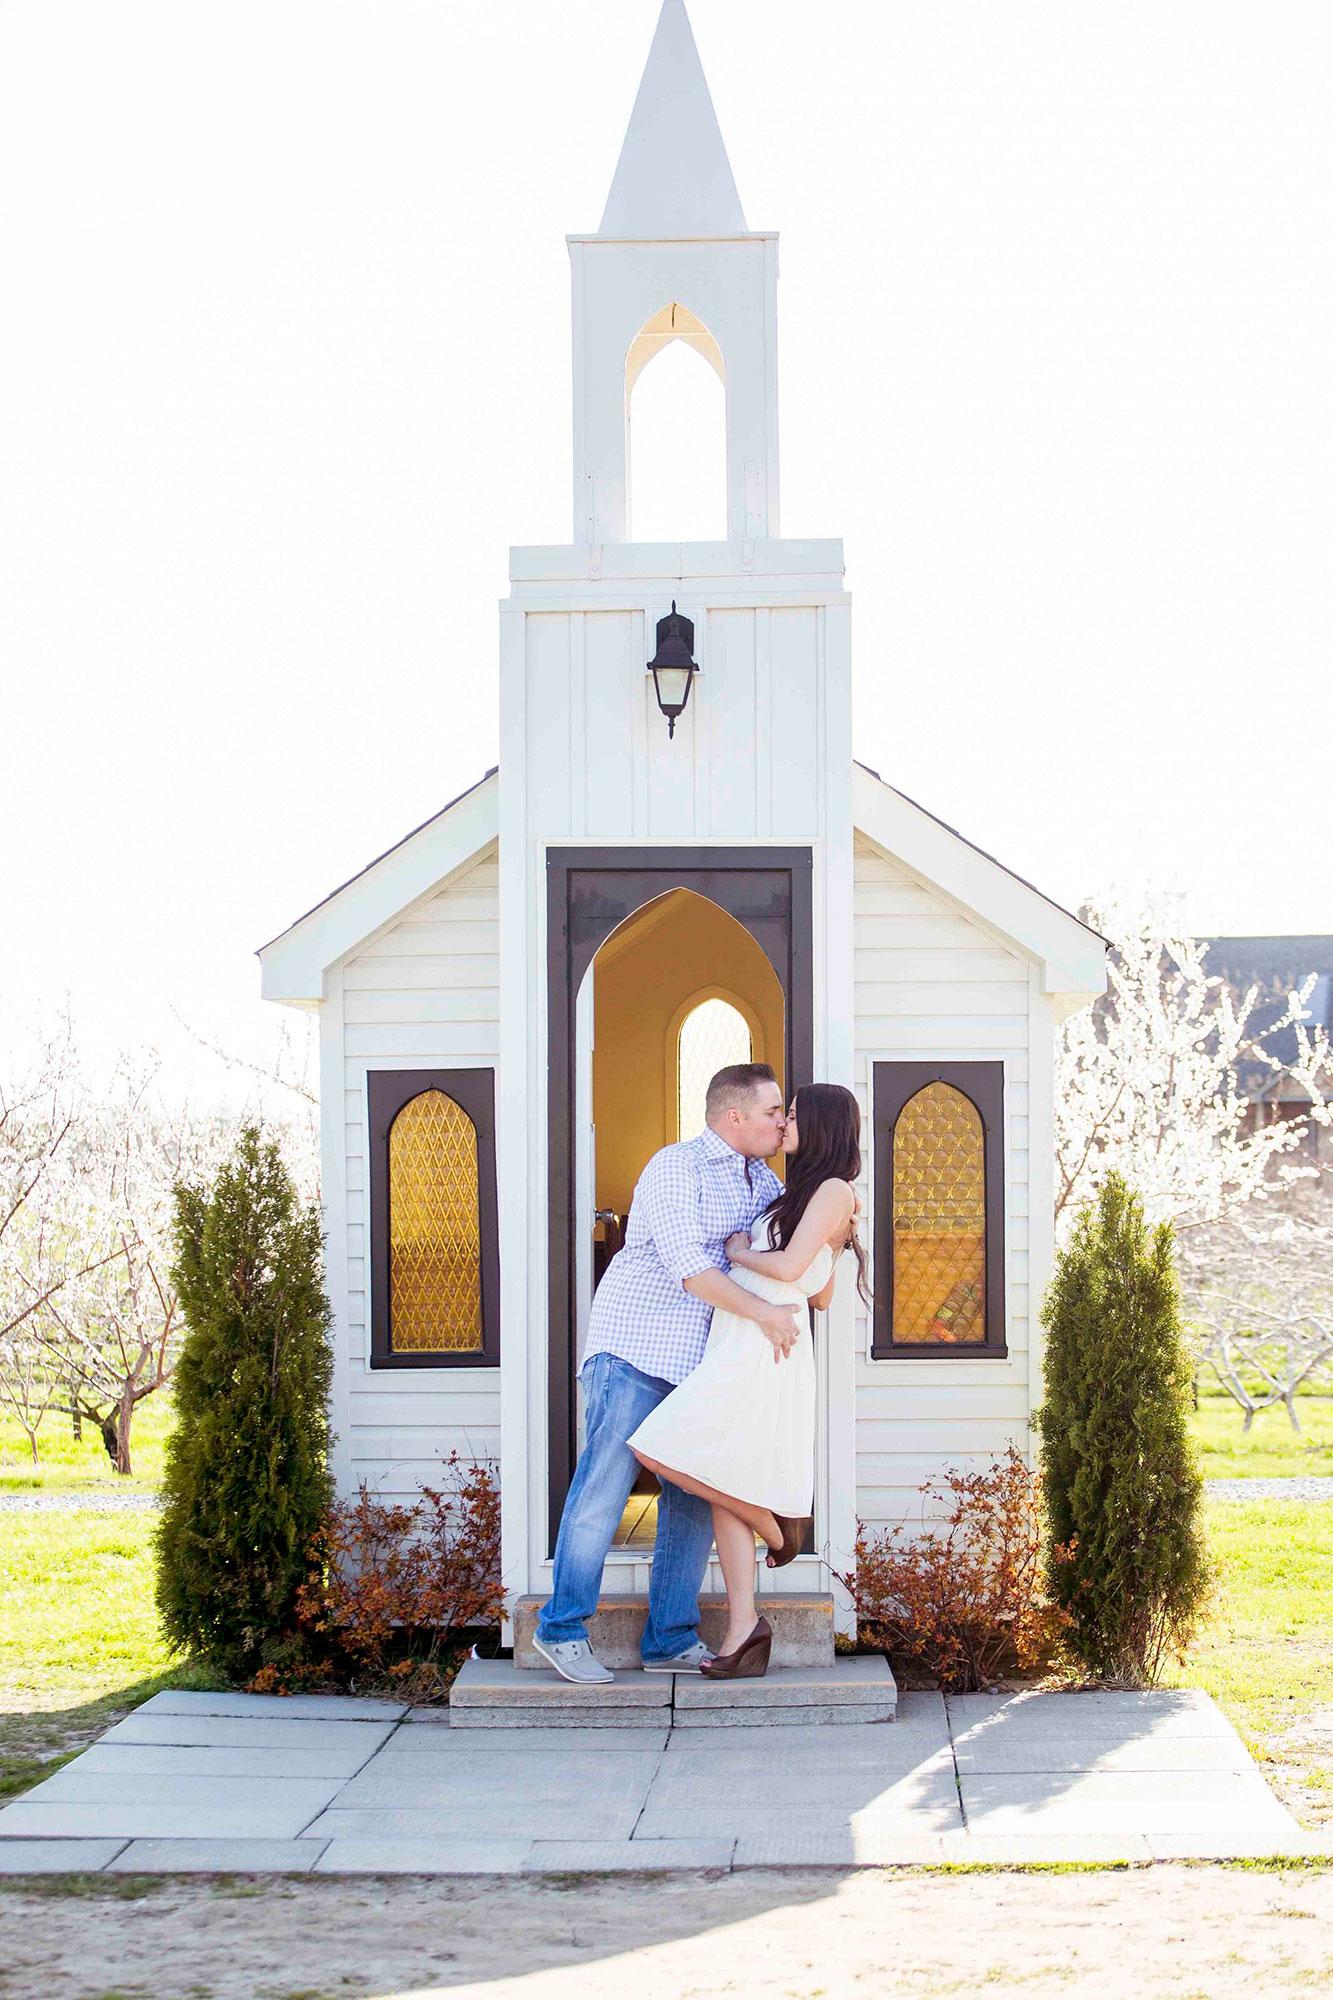 Niagara-on-the-Lake-Engagement-Vineyard-Bride-Photo-By-Gemini-Photography-008.jpg